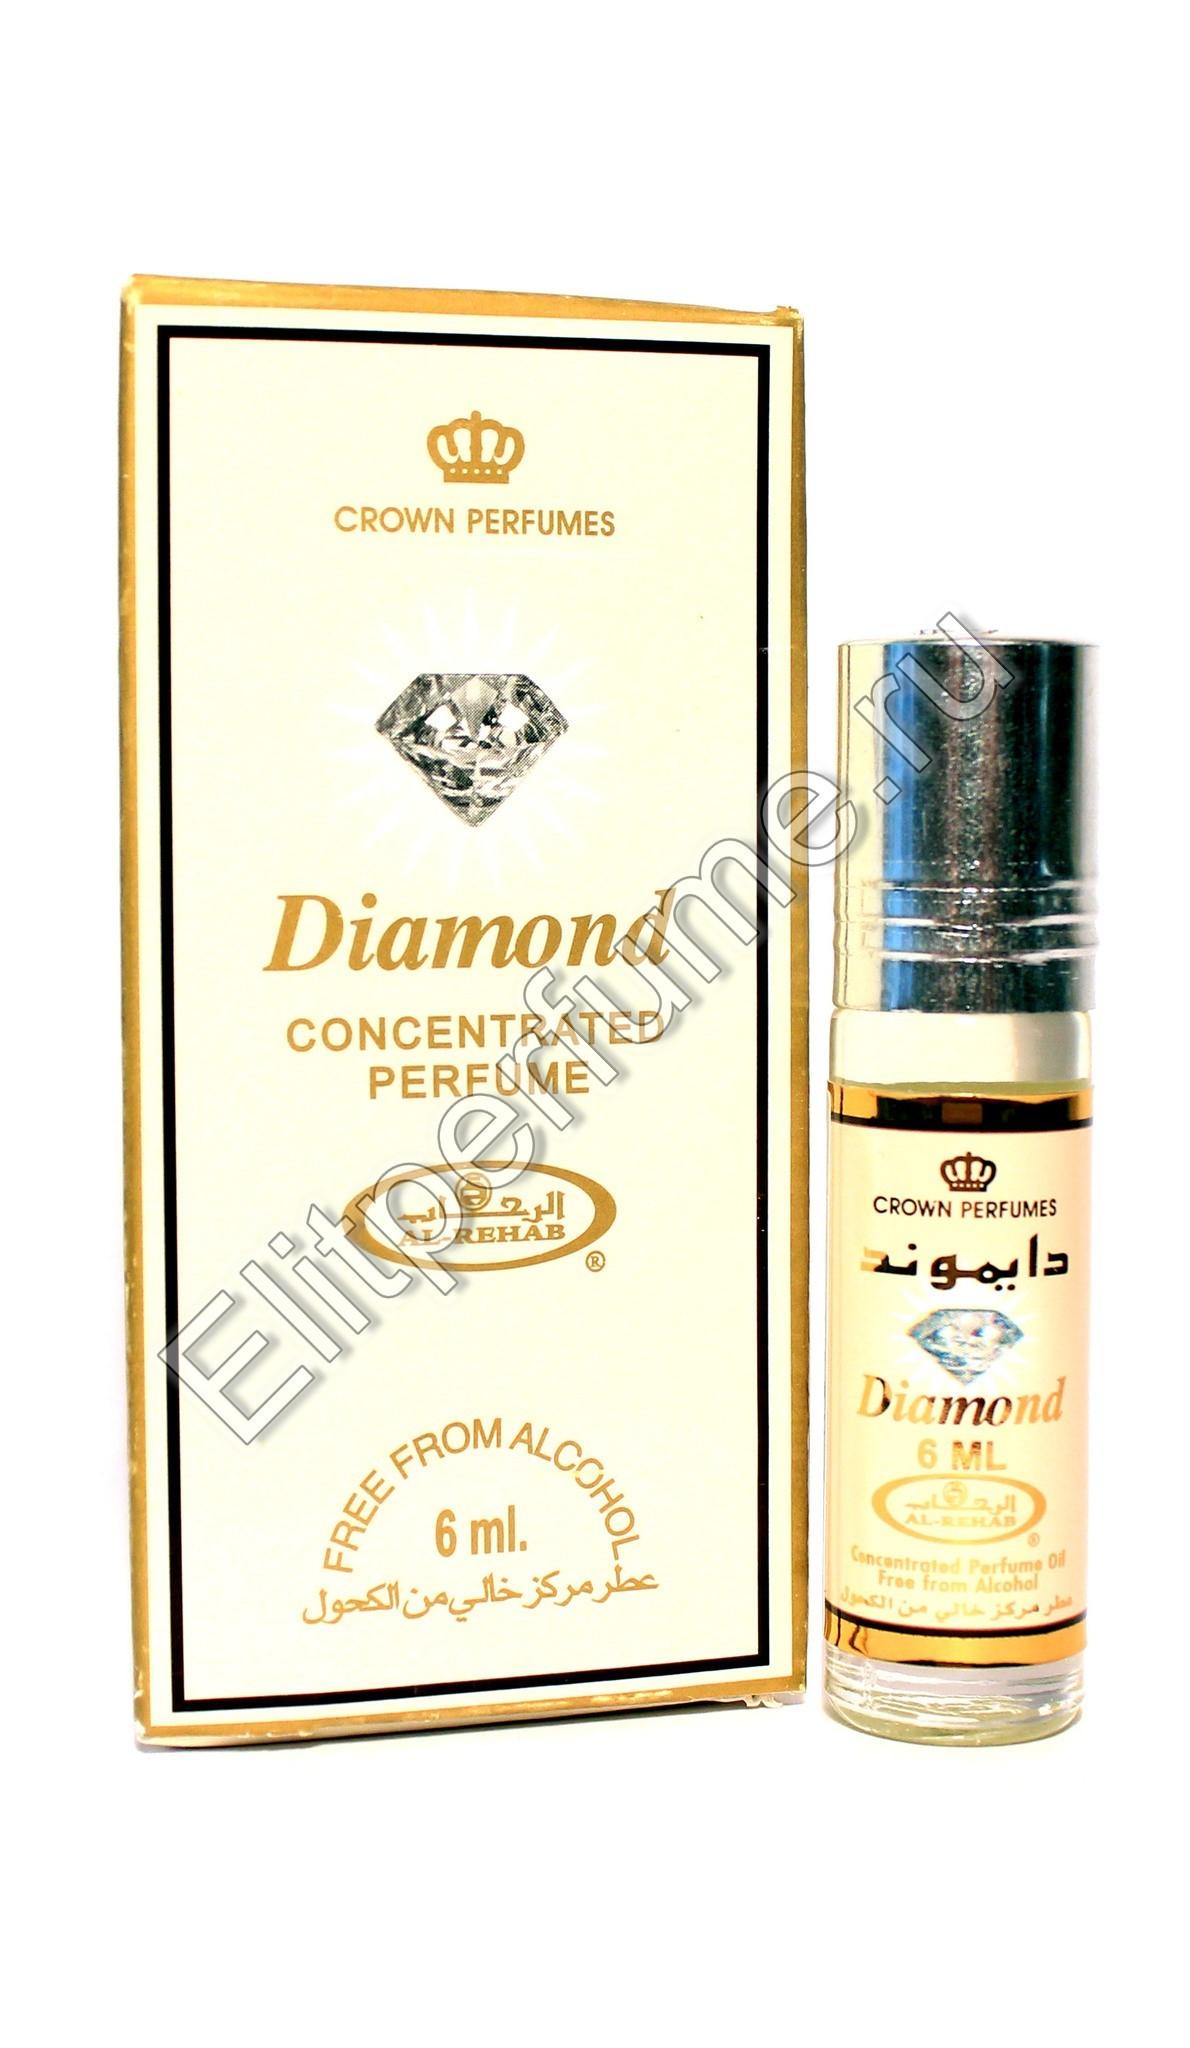 Diamond Даймонд 6 мл арабские масляные духи от Аль Рехаб Al Rehab